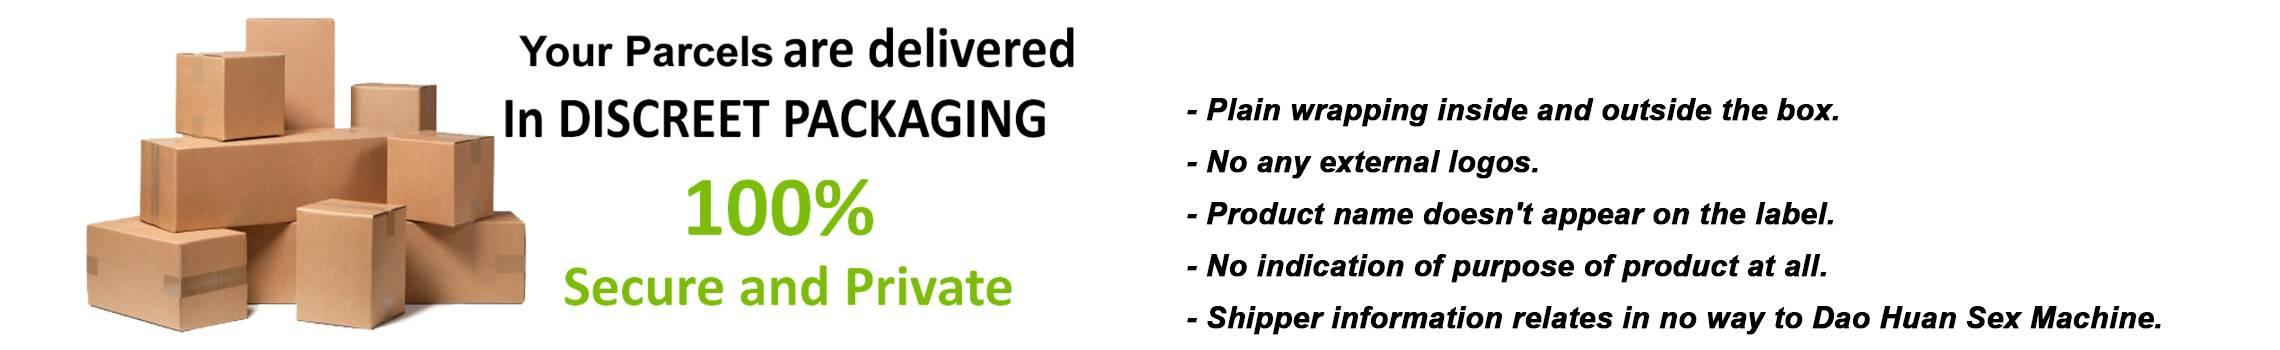 Discreet Packaging and Billing